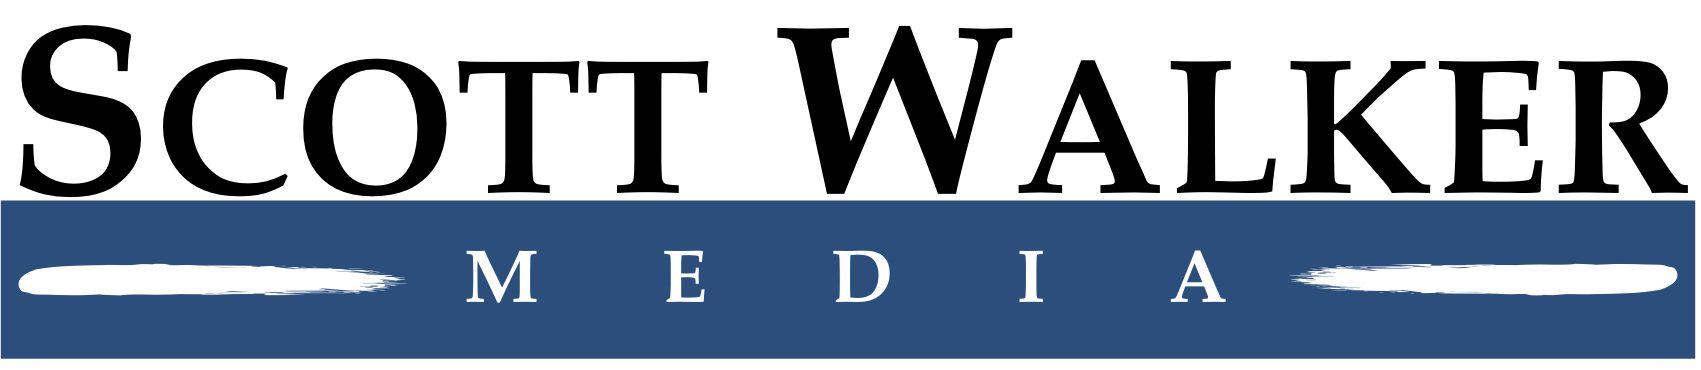 cropped-swm-logo-copy.jpg